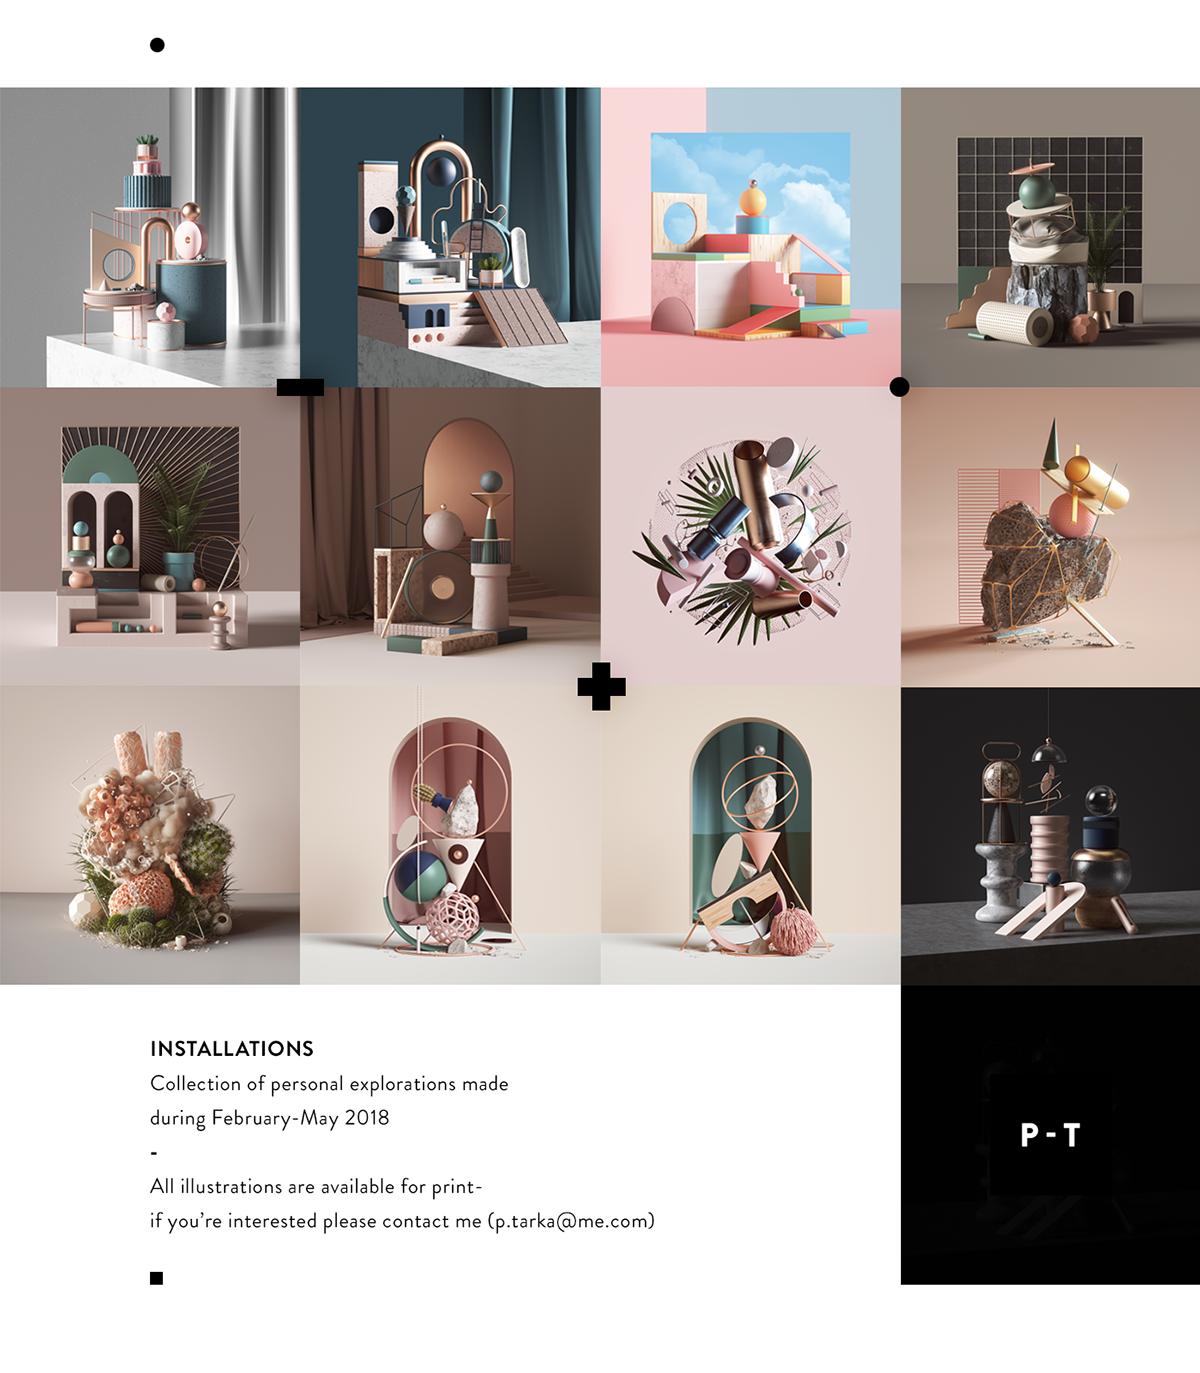 set 3D CGI c4d ILLUSTRATION  modern installations renedr studio abstract